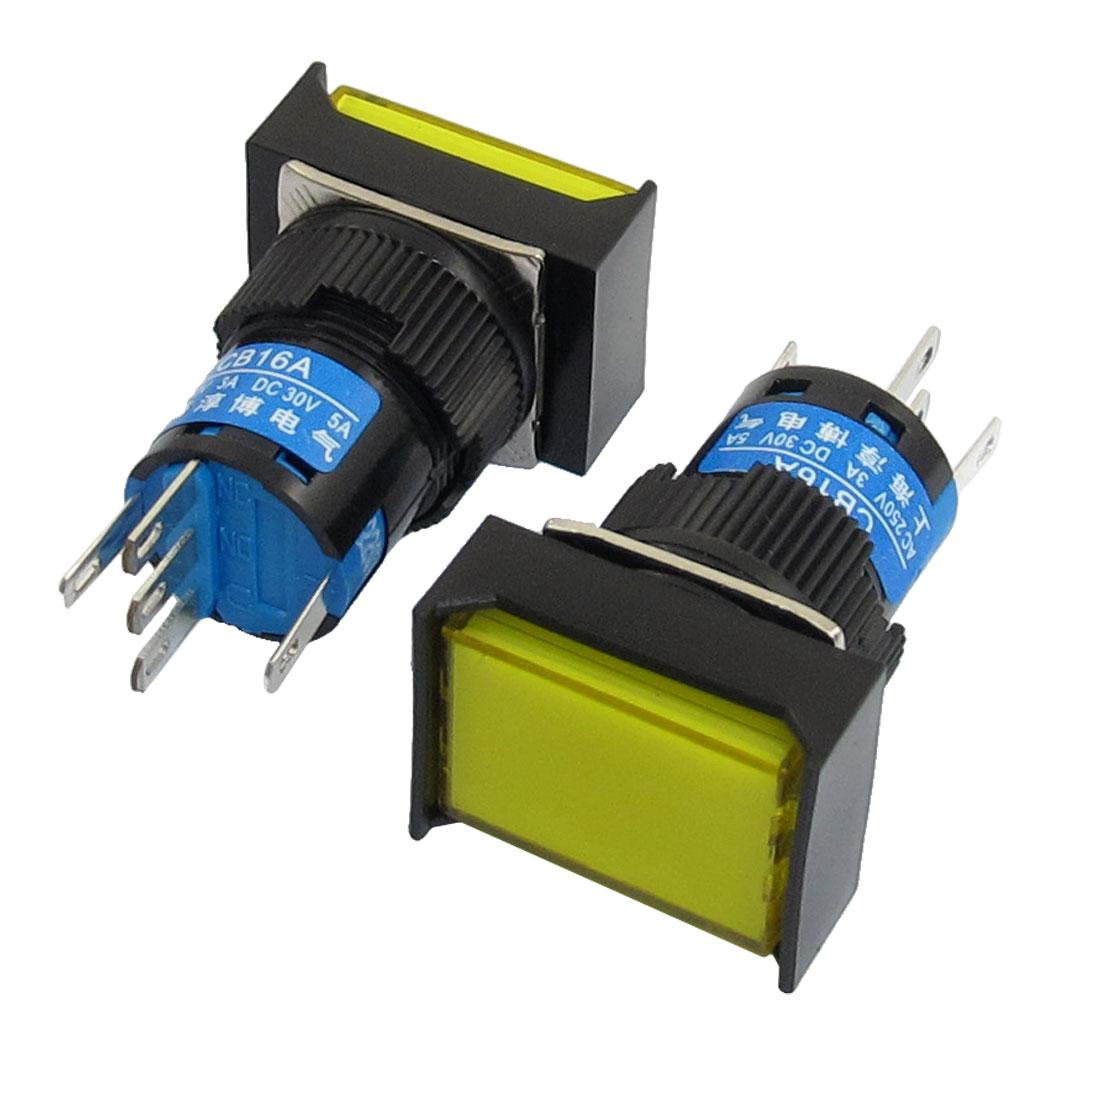 AC220V Lamp 1NO 1NC Latching Yellow Cap Rectangular Push Button Switch 2Pcs